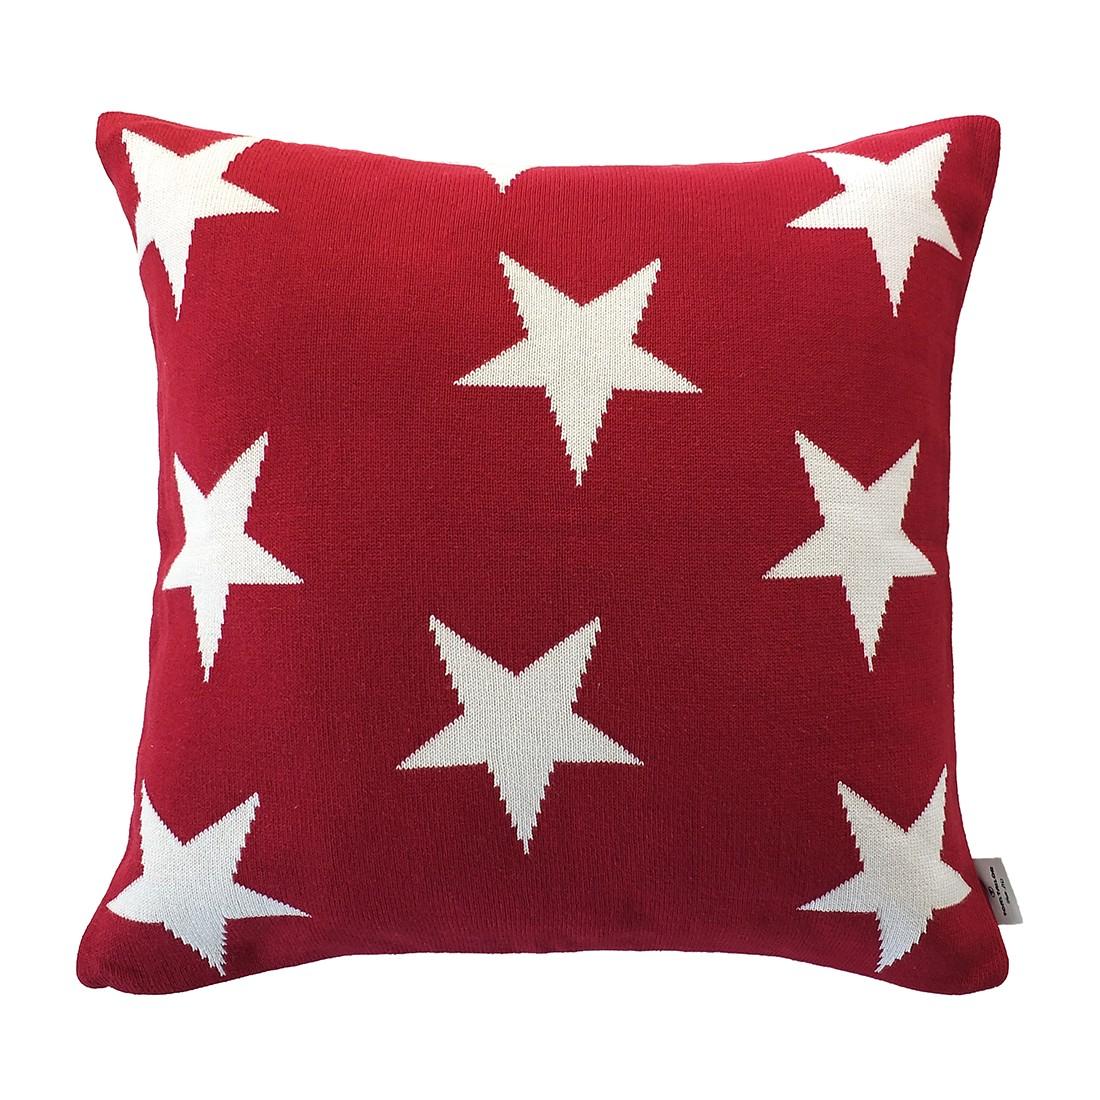 Kissenhülle T-Big Star – Dunkelrot – Maße: 50 x 50 cm, Tom Tailor günstig online kaufen